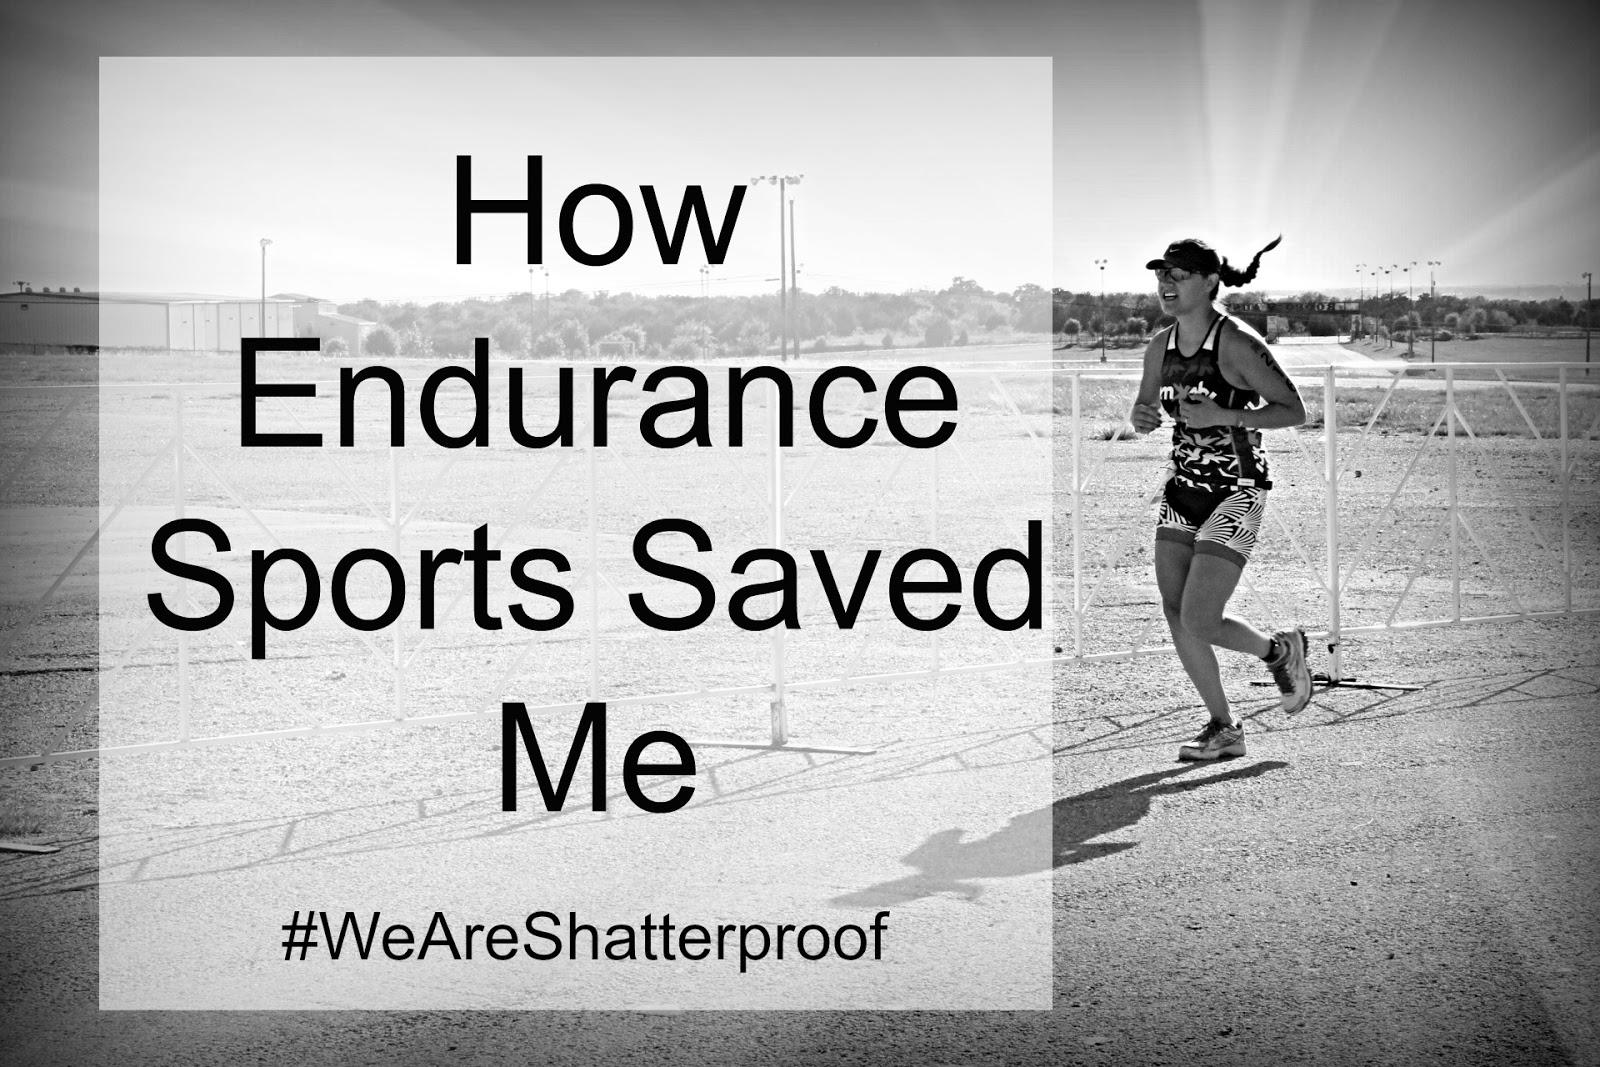 Overcoming Depression, Self-harm & Addiction – How Endurance Sports Saved Me